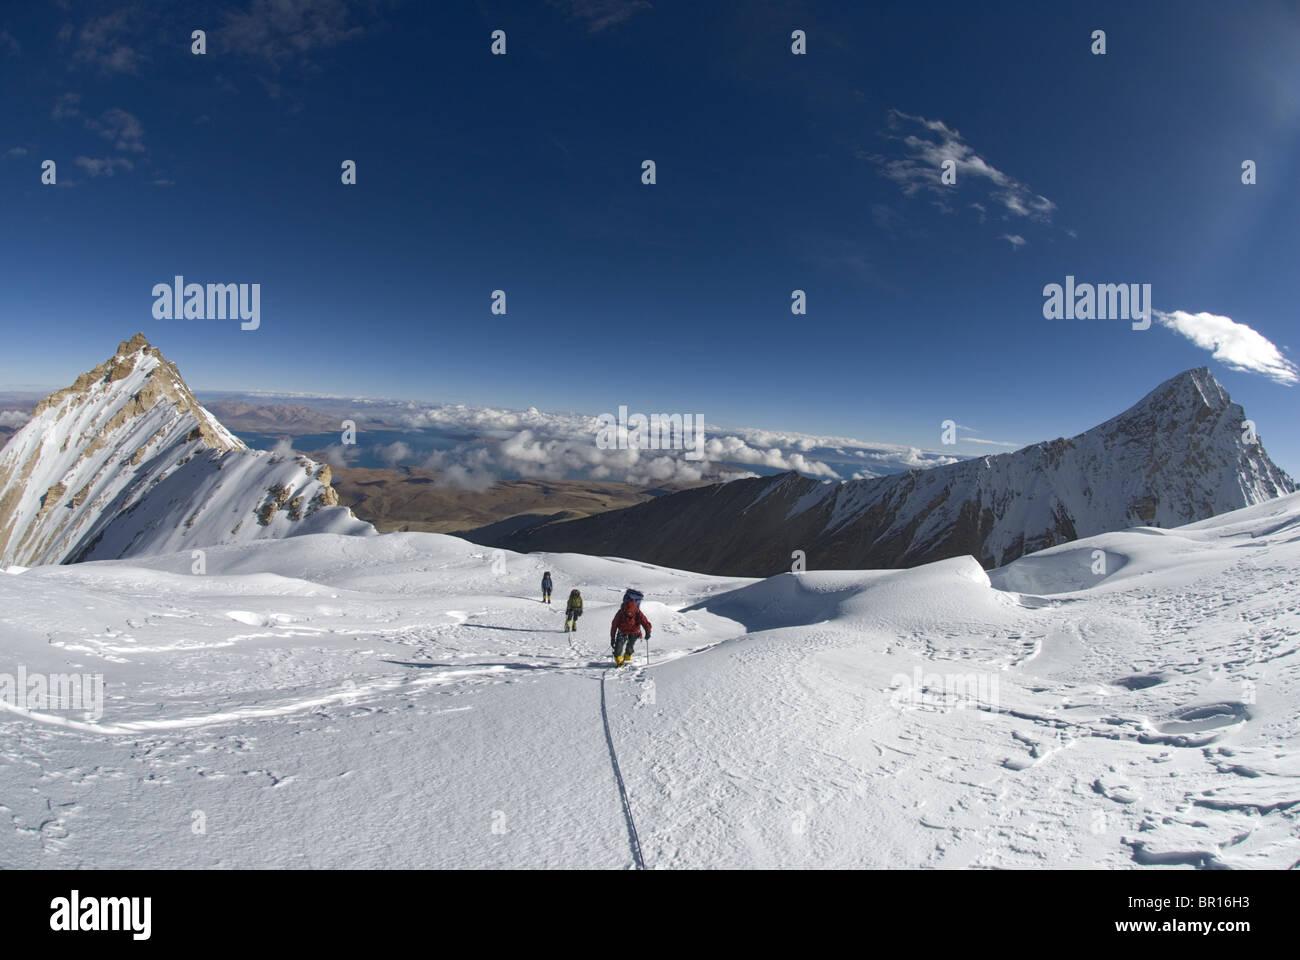 Three climbers on Gurla Mandhata, Tibet. - Stock Image